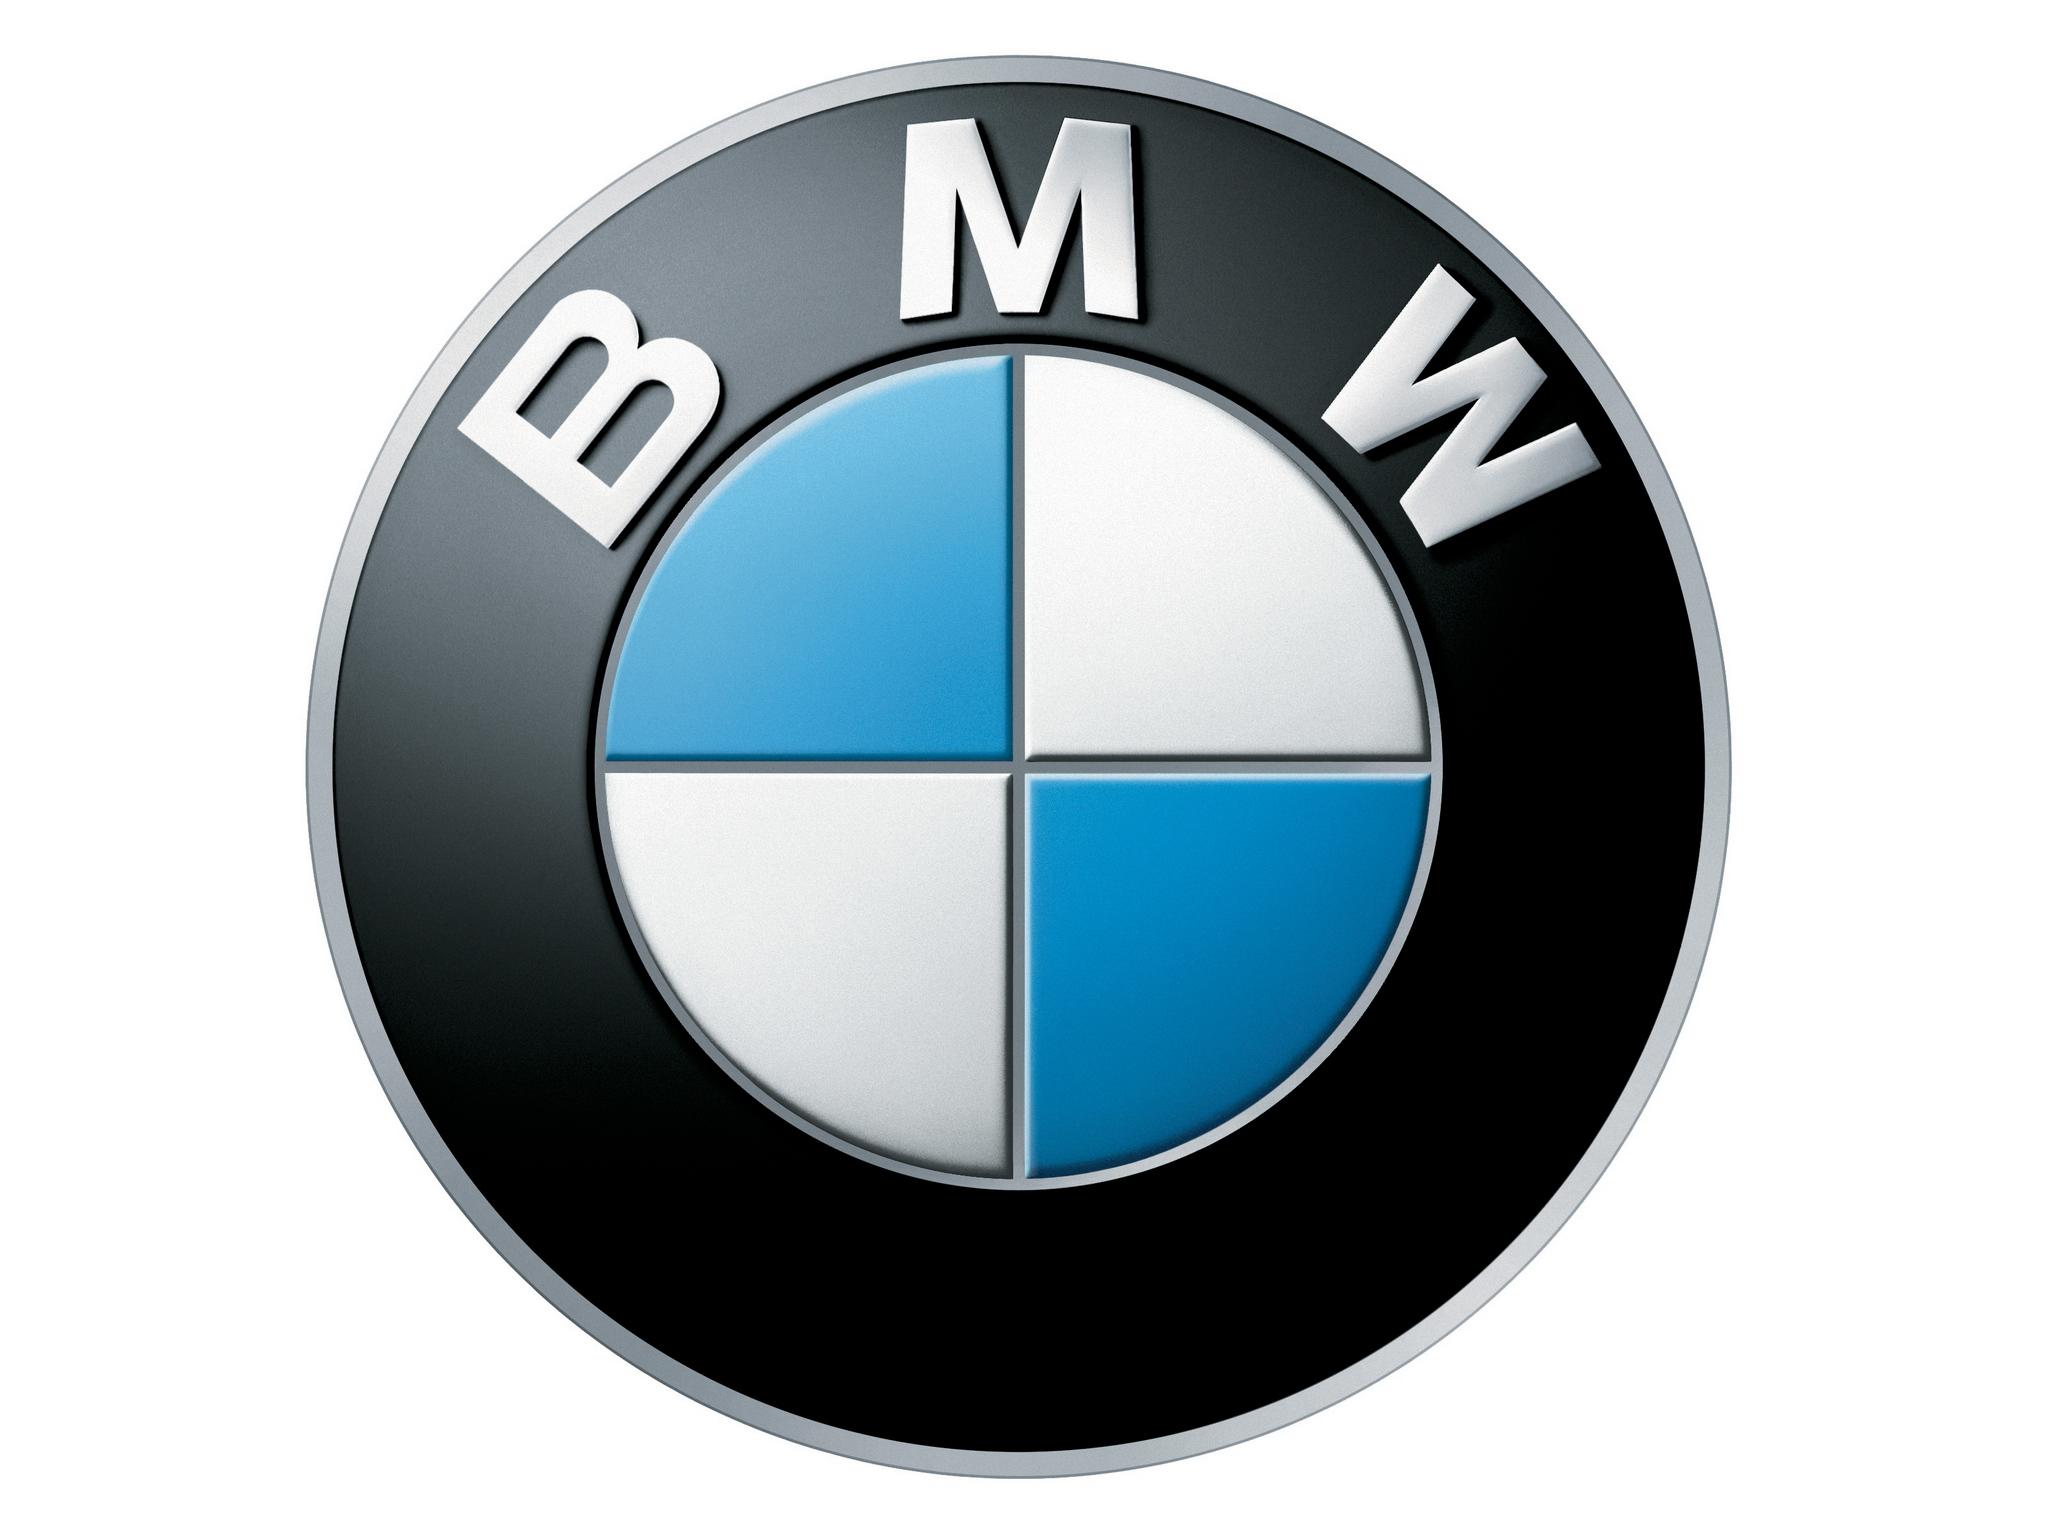 фото бмв логотип